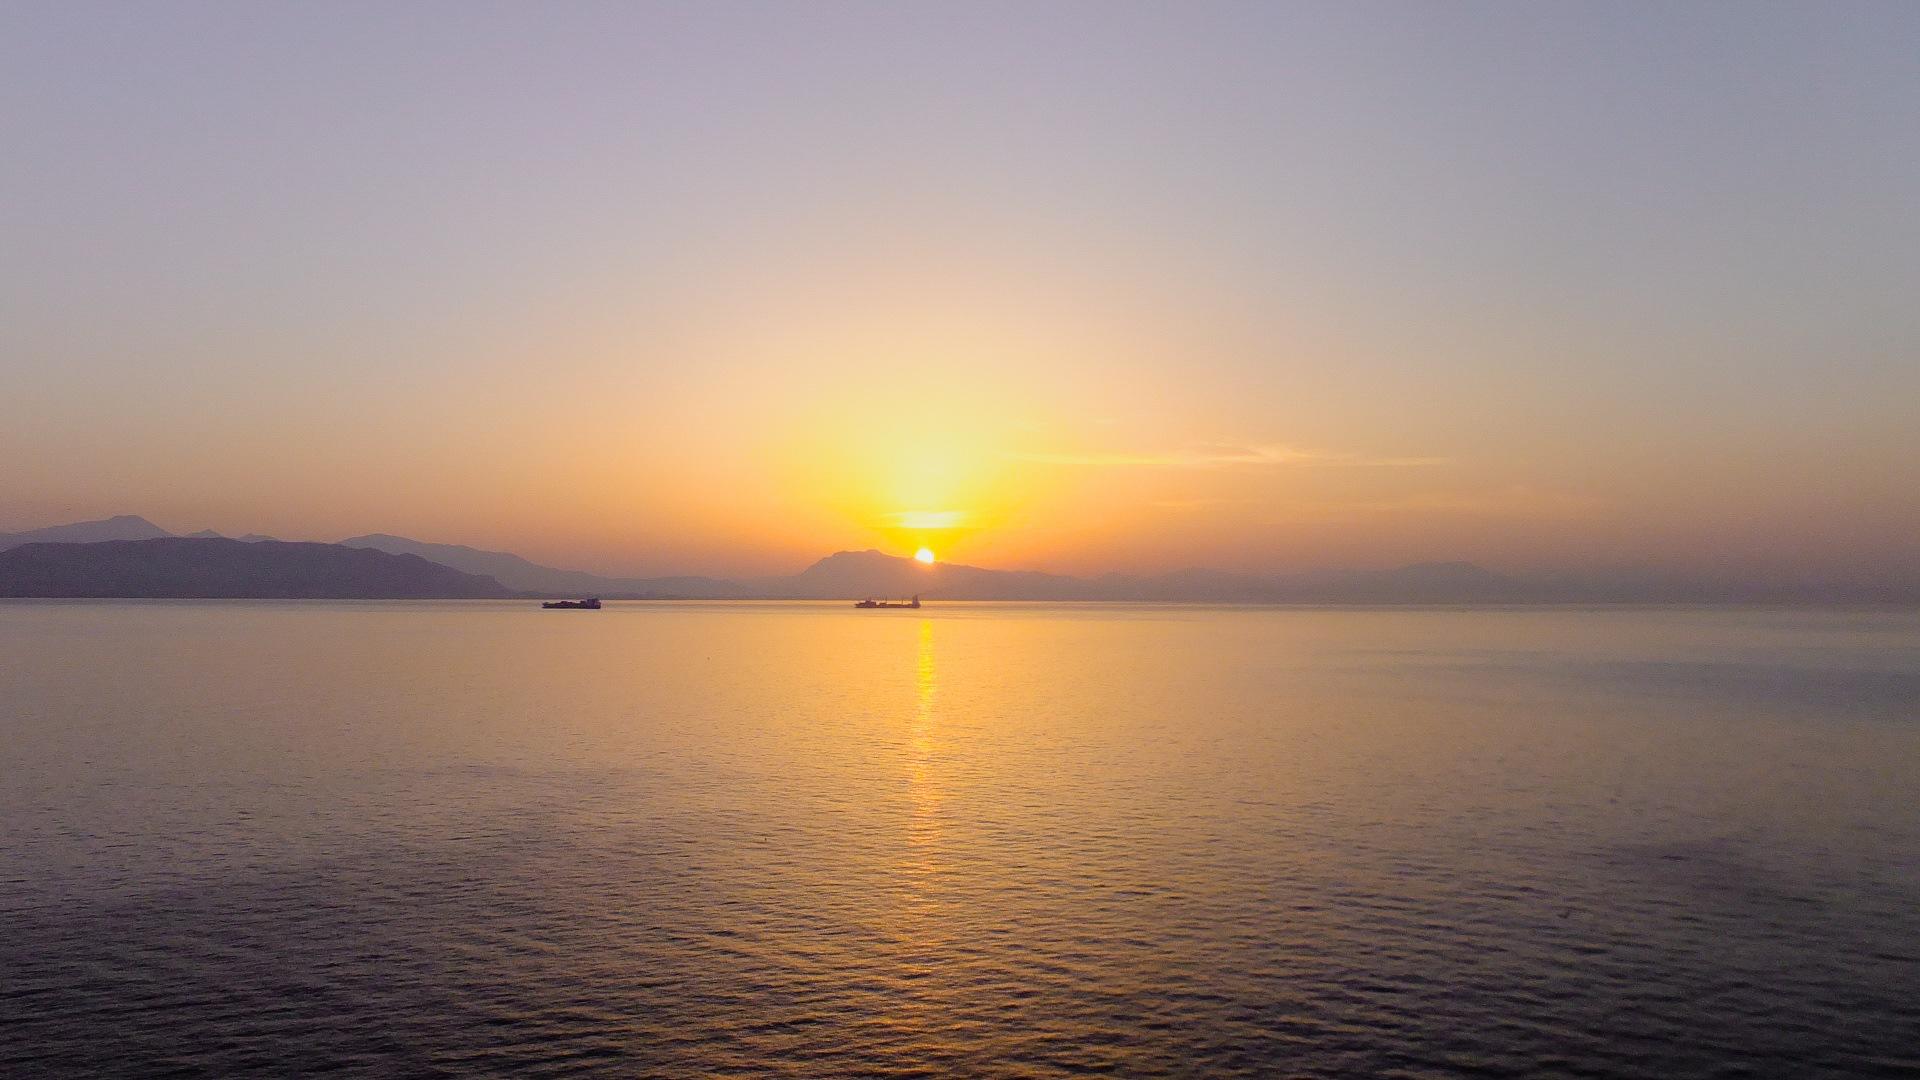 Amalfi Coast, Italy by Karen Bekker